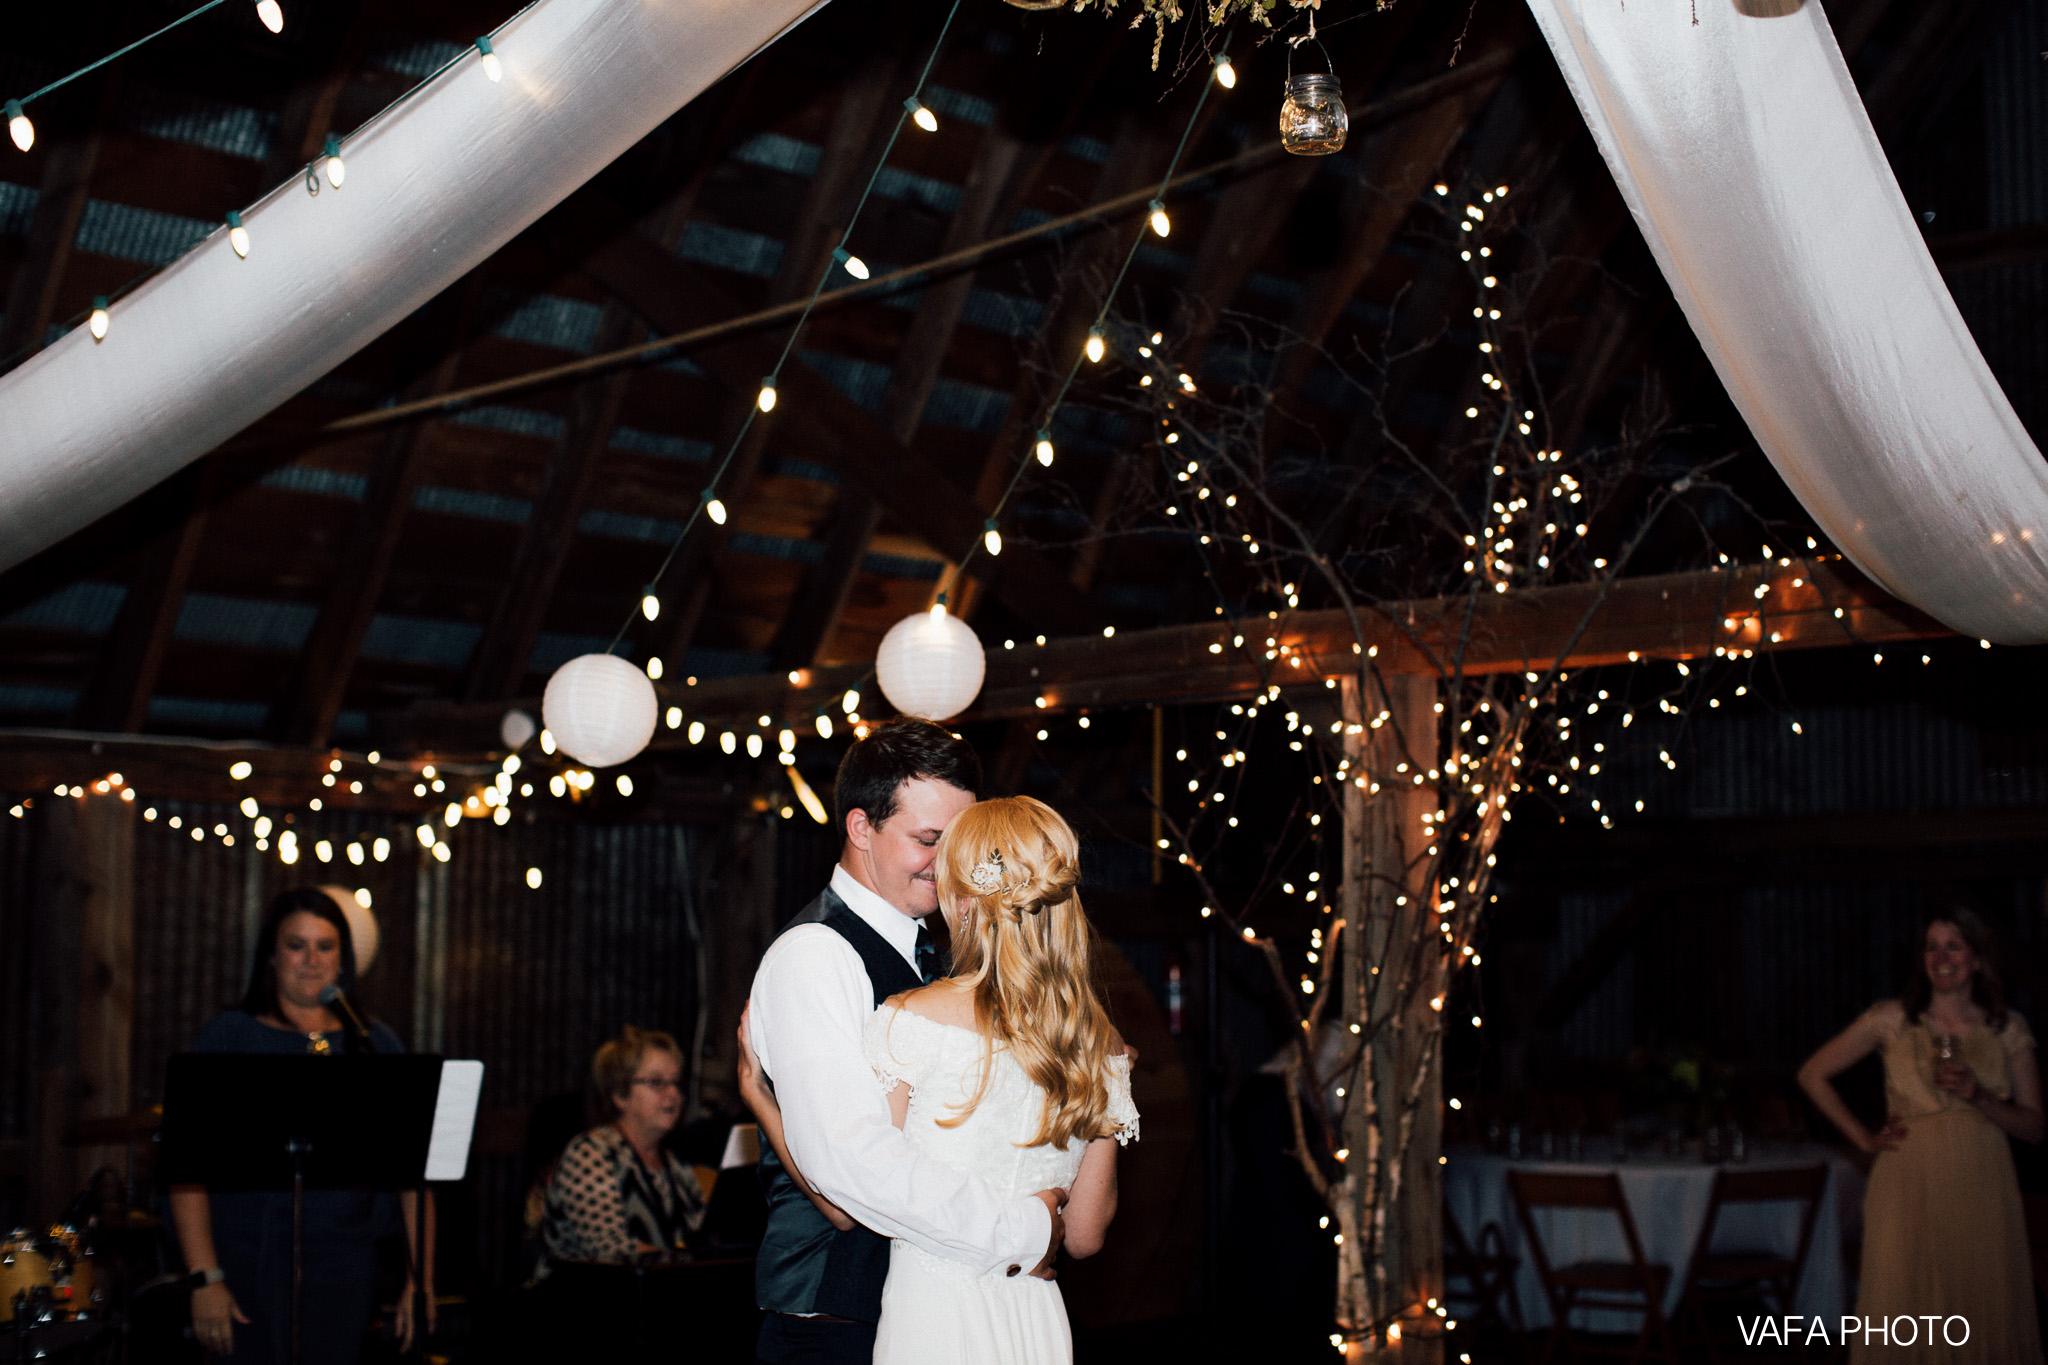 Belsolda-Farm-Wedding-Christy-Eric-Vafa-Photo-700.jpg